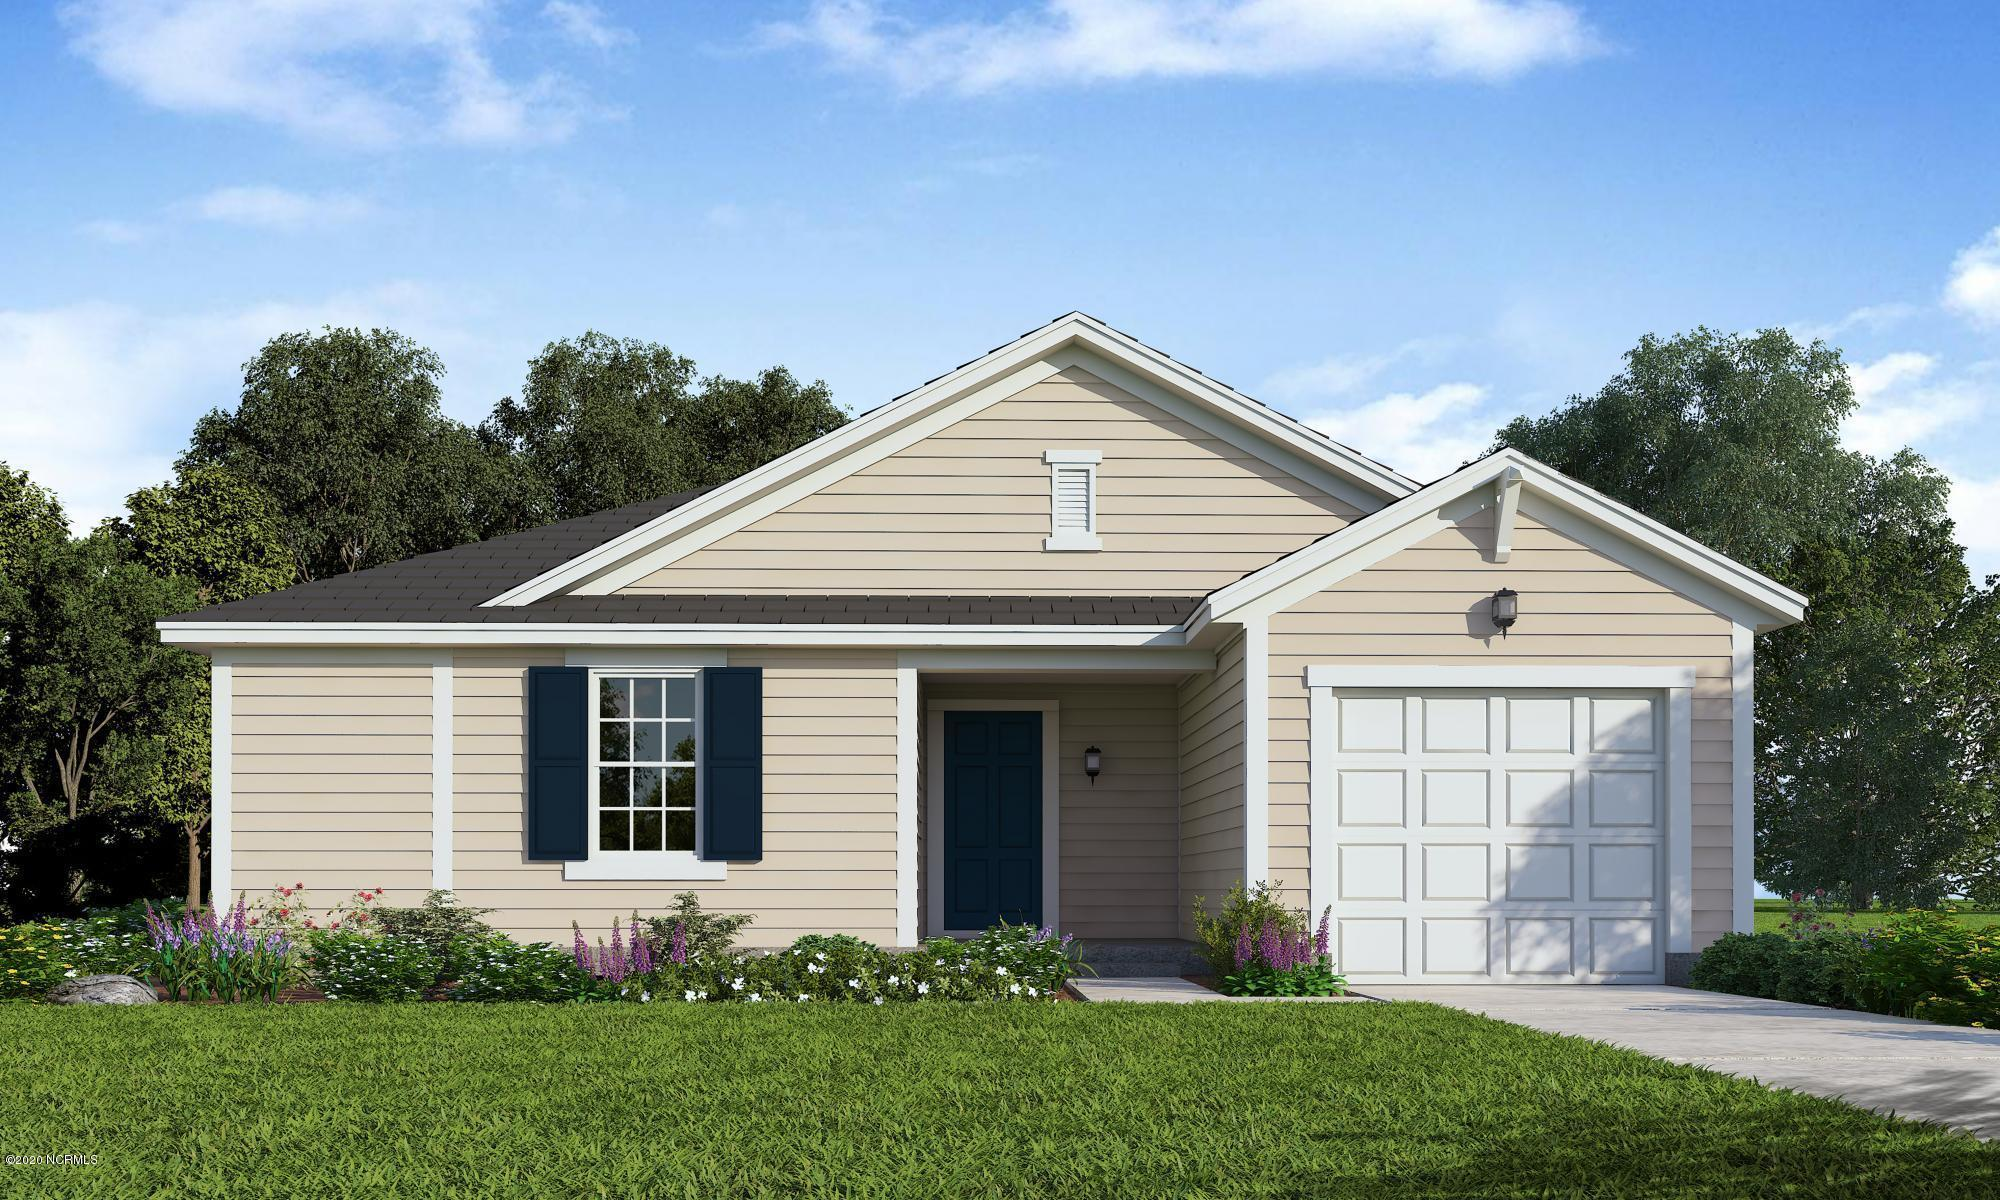 765 Landmark Cove, Carolina Shores, North Carolina 28467, 3 Bedrooms Bedrooms, ,2 BathroomsBathrooms,Residential,For Sale,Landmark,100226359